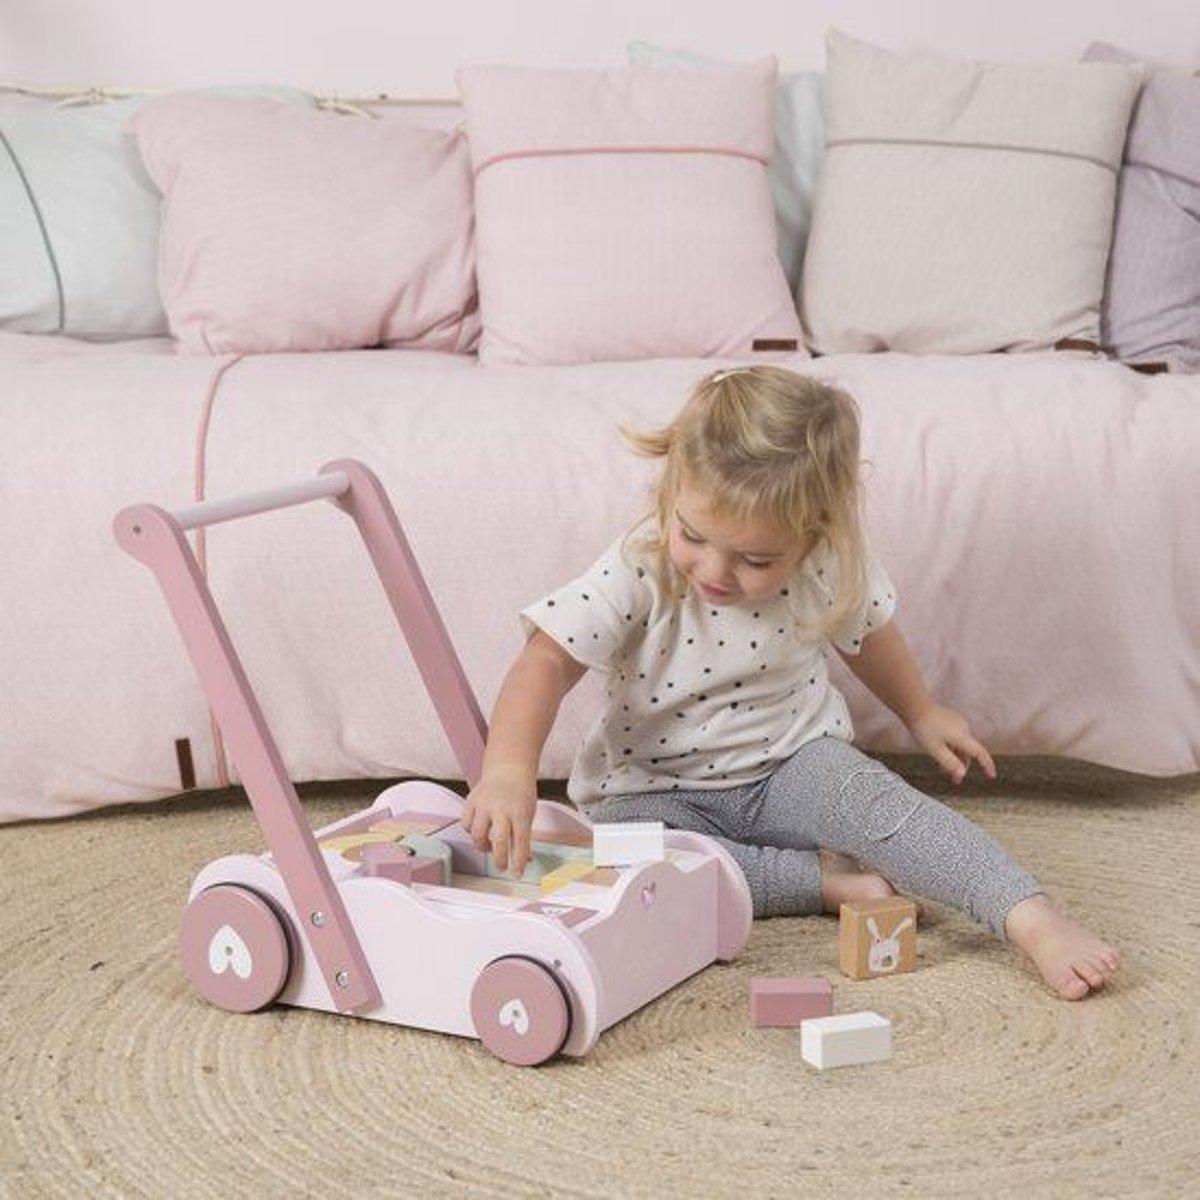 273054cac2c609 bol.com | Little Dutch Blokkenkar Adventure pink, Little Dutch | Speelgoed